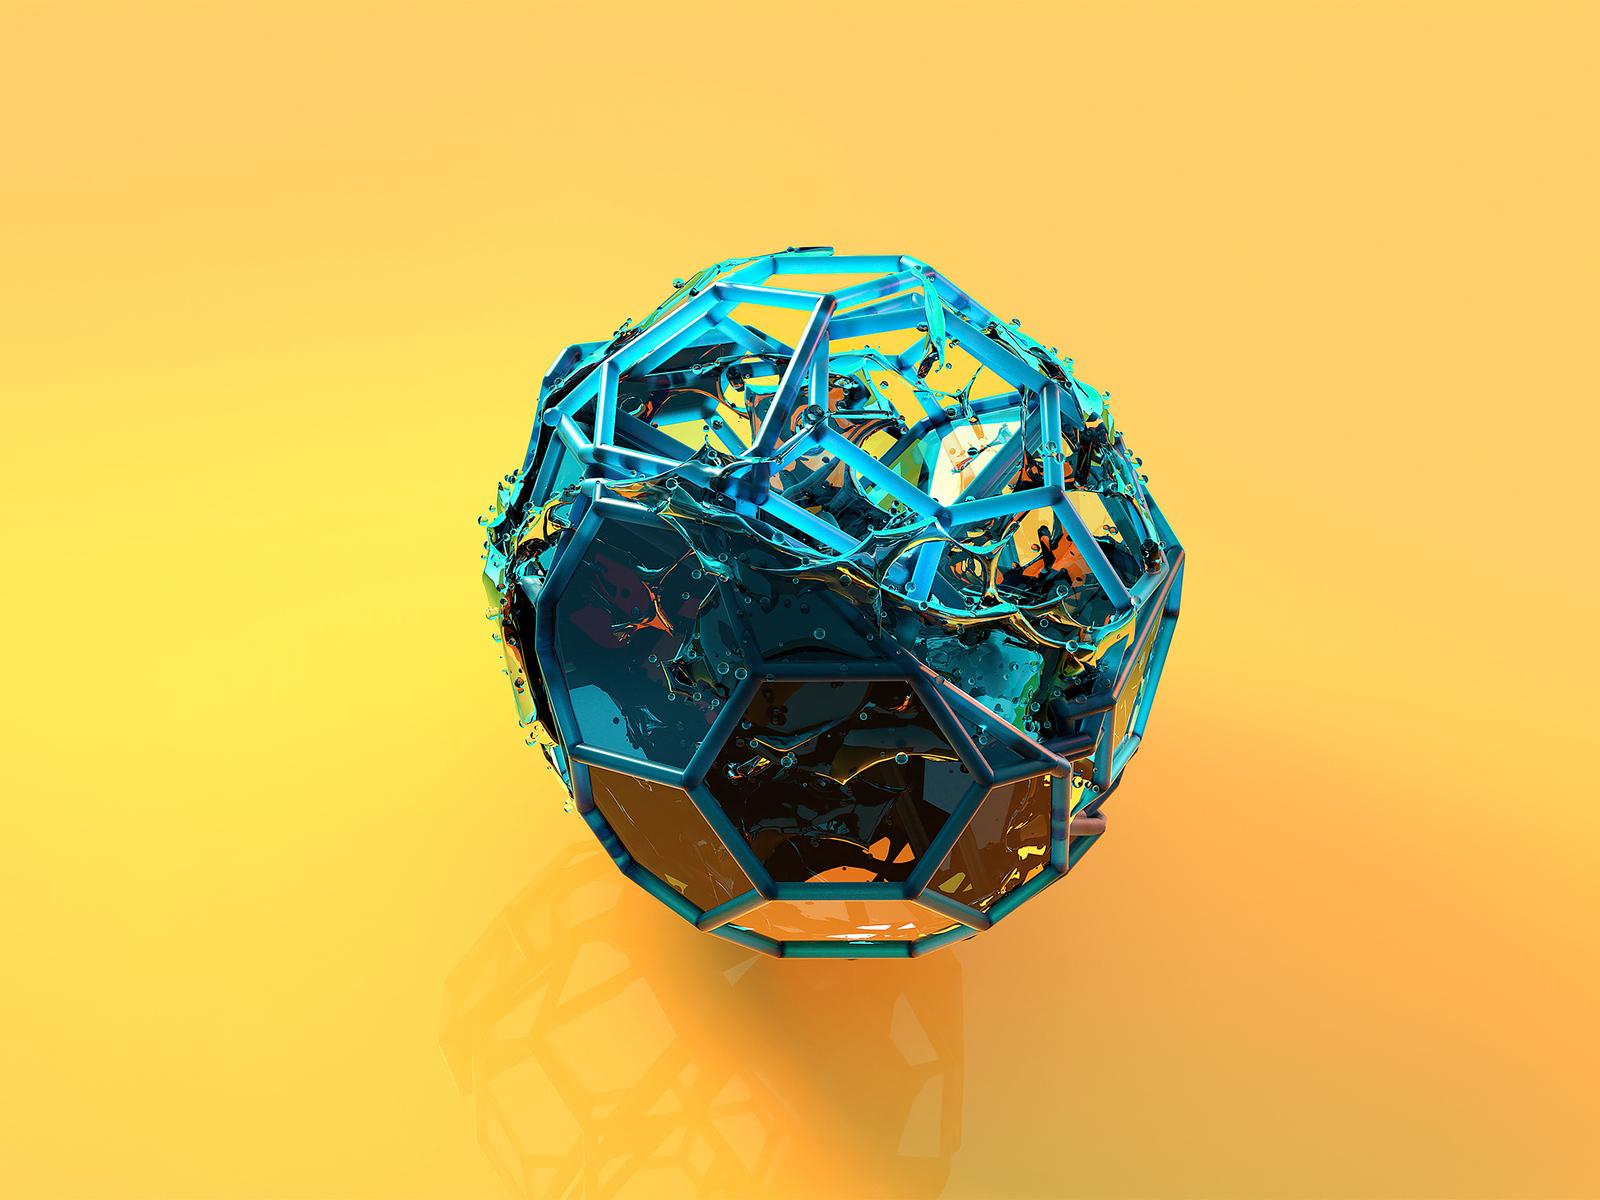 blue-cube-scifi-abstract-4k-5v.jpg